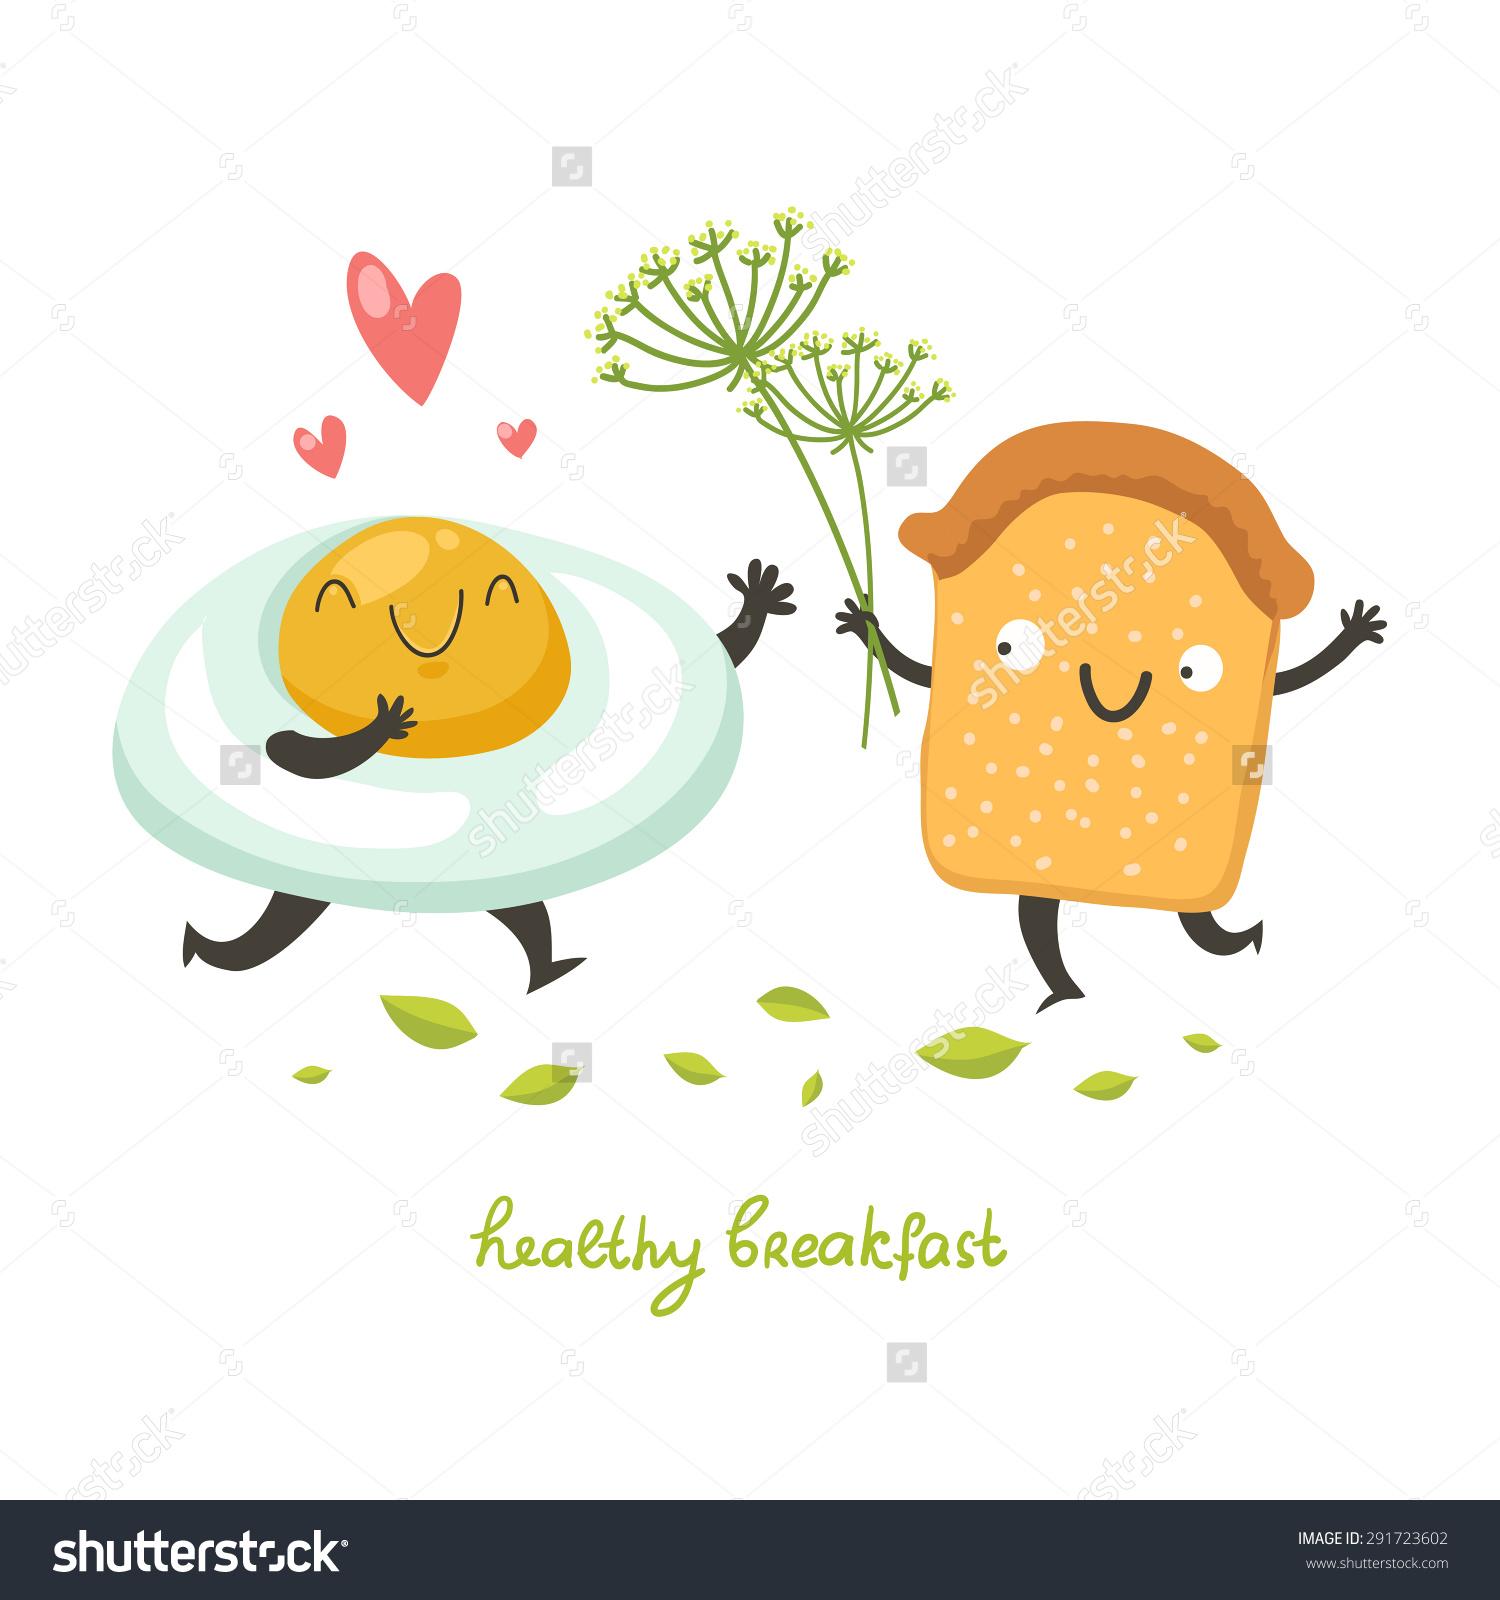 Vector Cute Breakfast Cartoon Egg Toast Stock Vector 291723602.